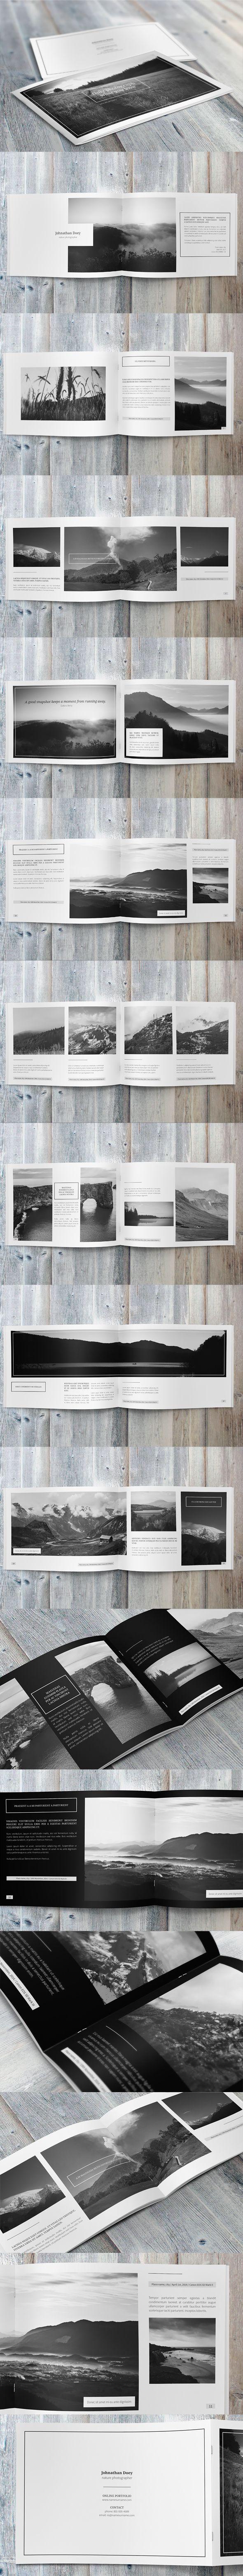 Minimalfolio Photography Portfolio A4 Brochure #5 on Behance